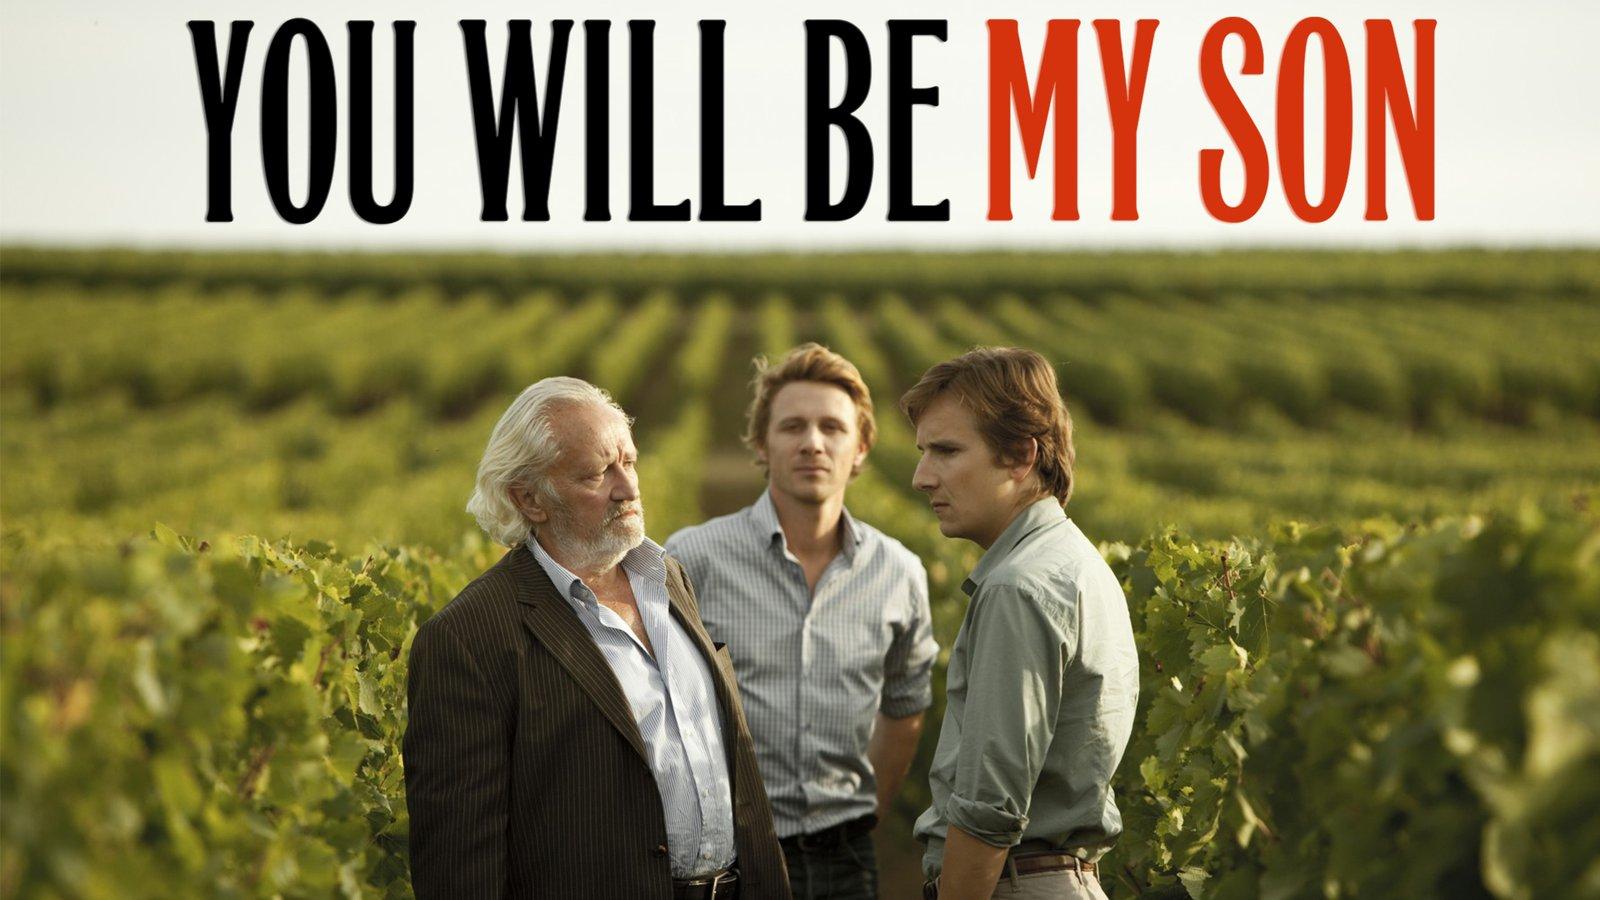 You Will Be My Son - Tu seras mon fils